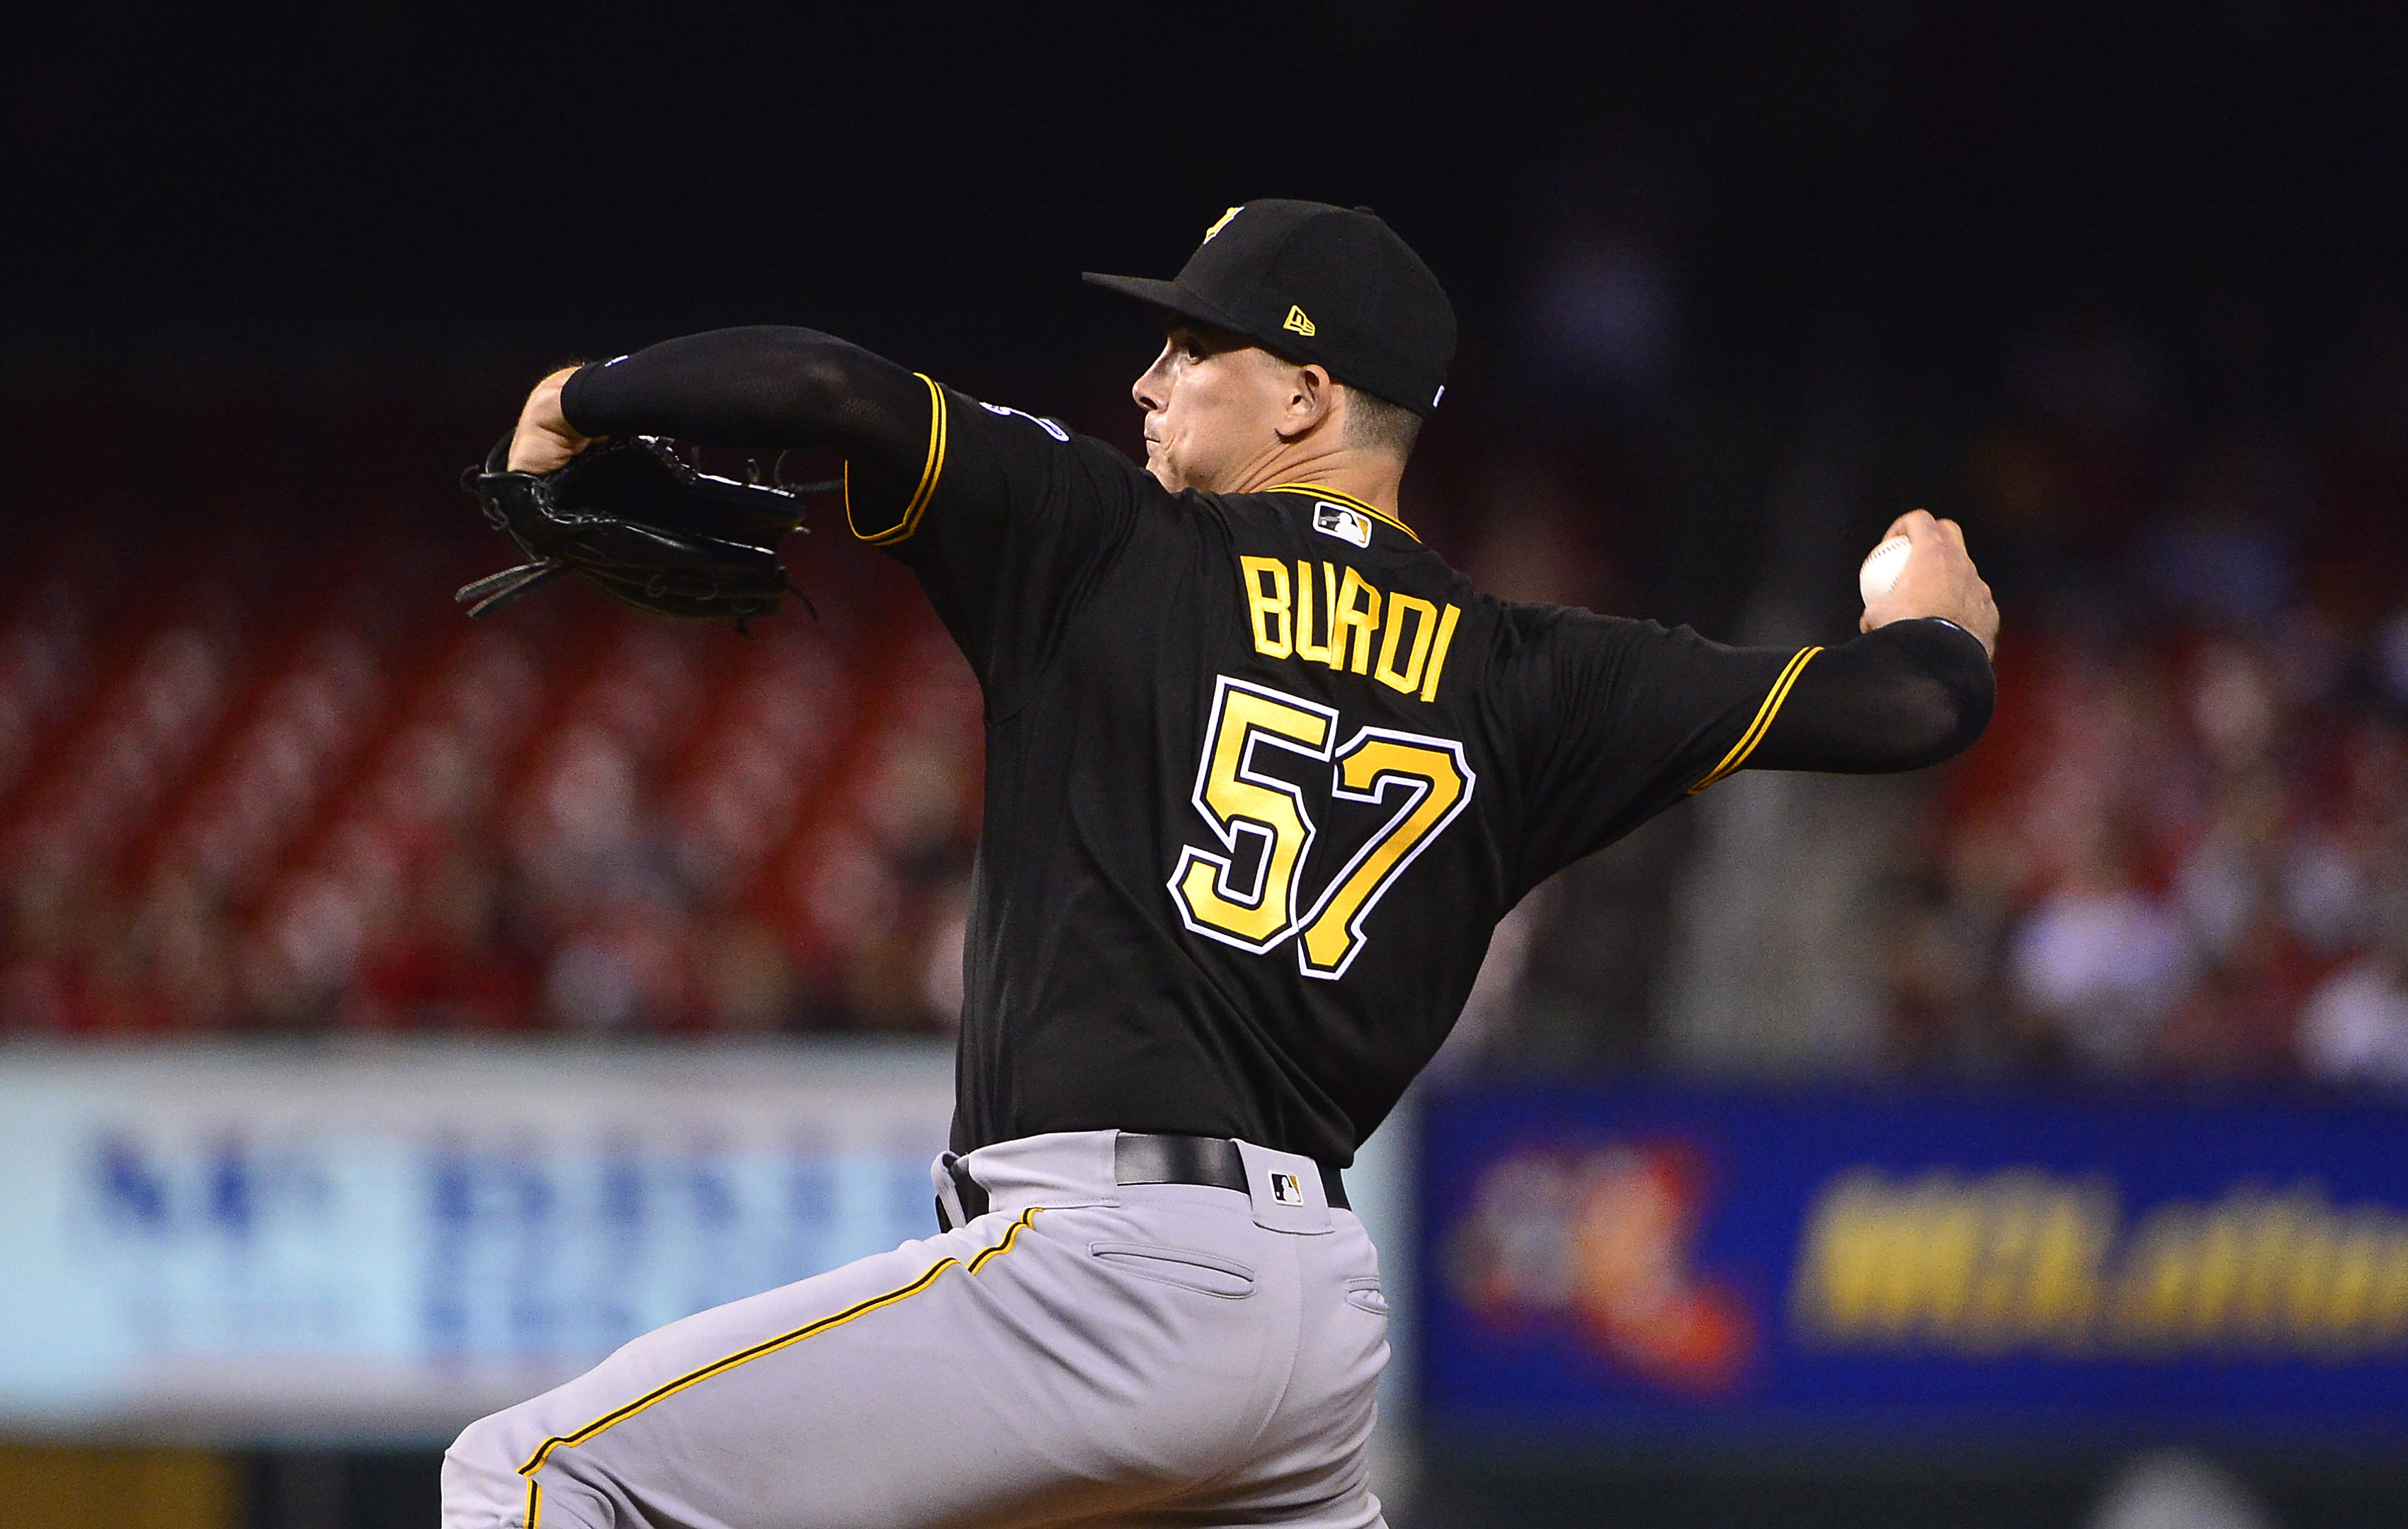 Looking Back At Nick Burdi's MLB Debut